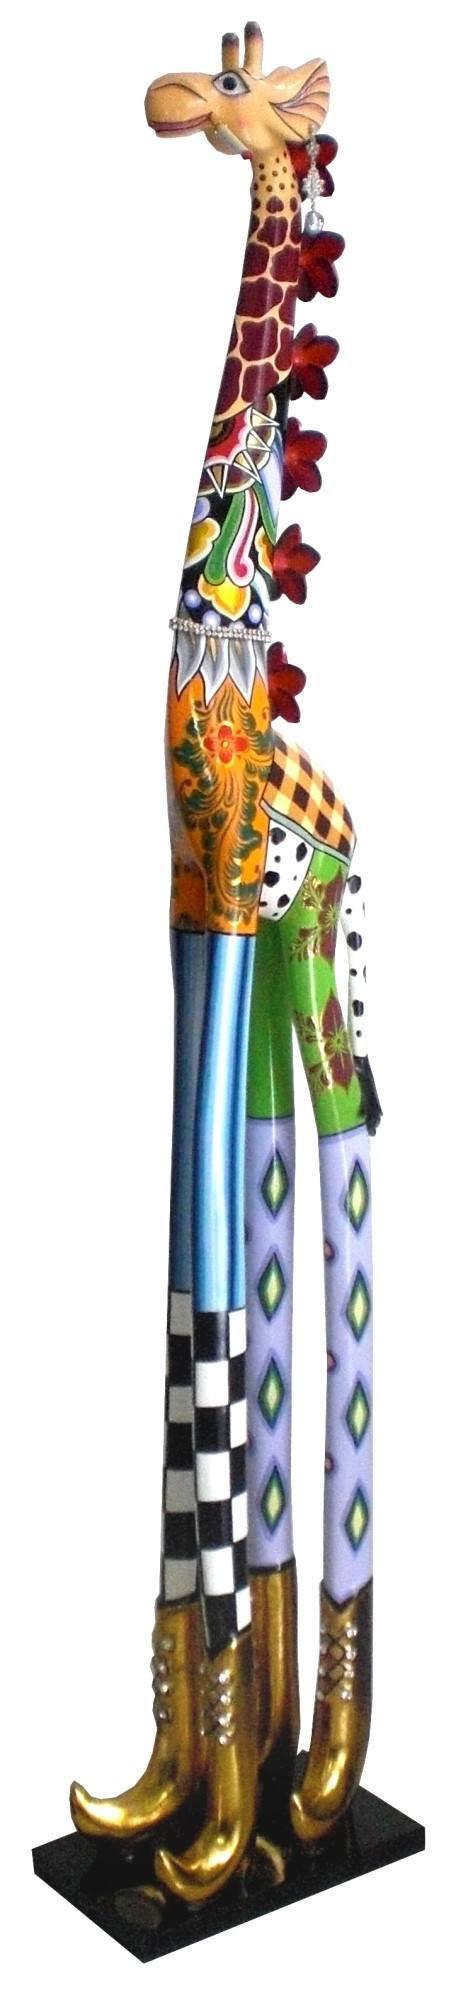 Toms Drag Escultura Jirafa ROXANNA DELUXE - 4135 - Tienda Online